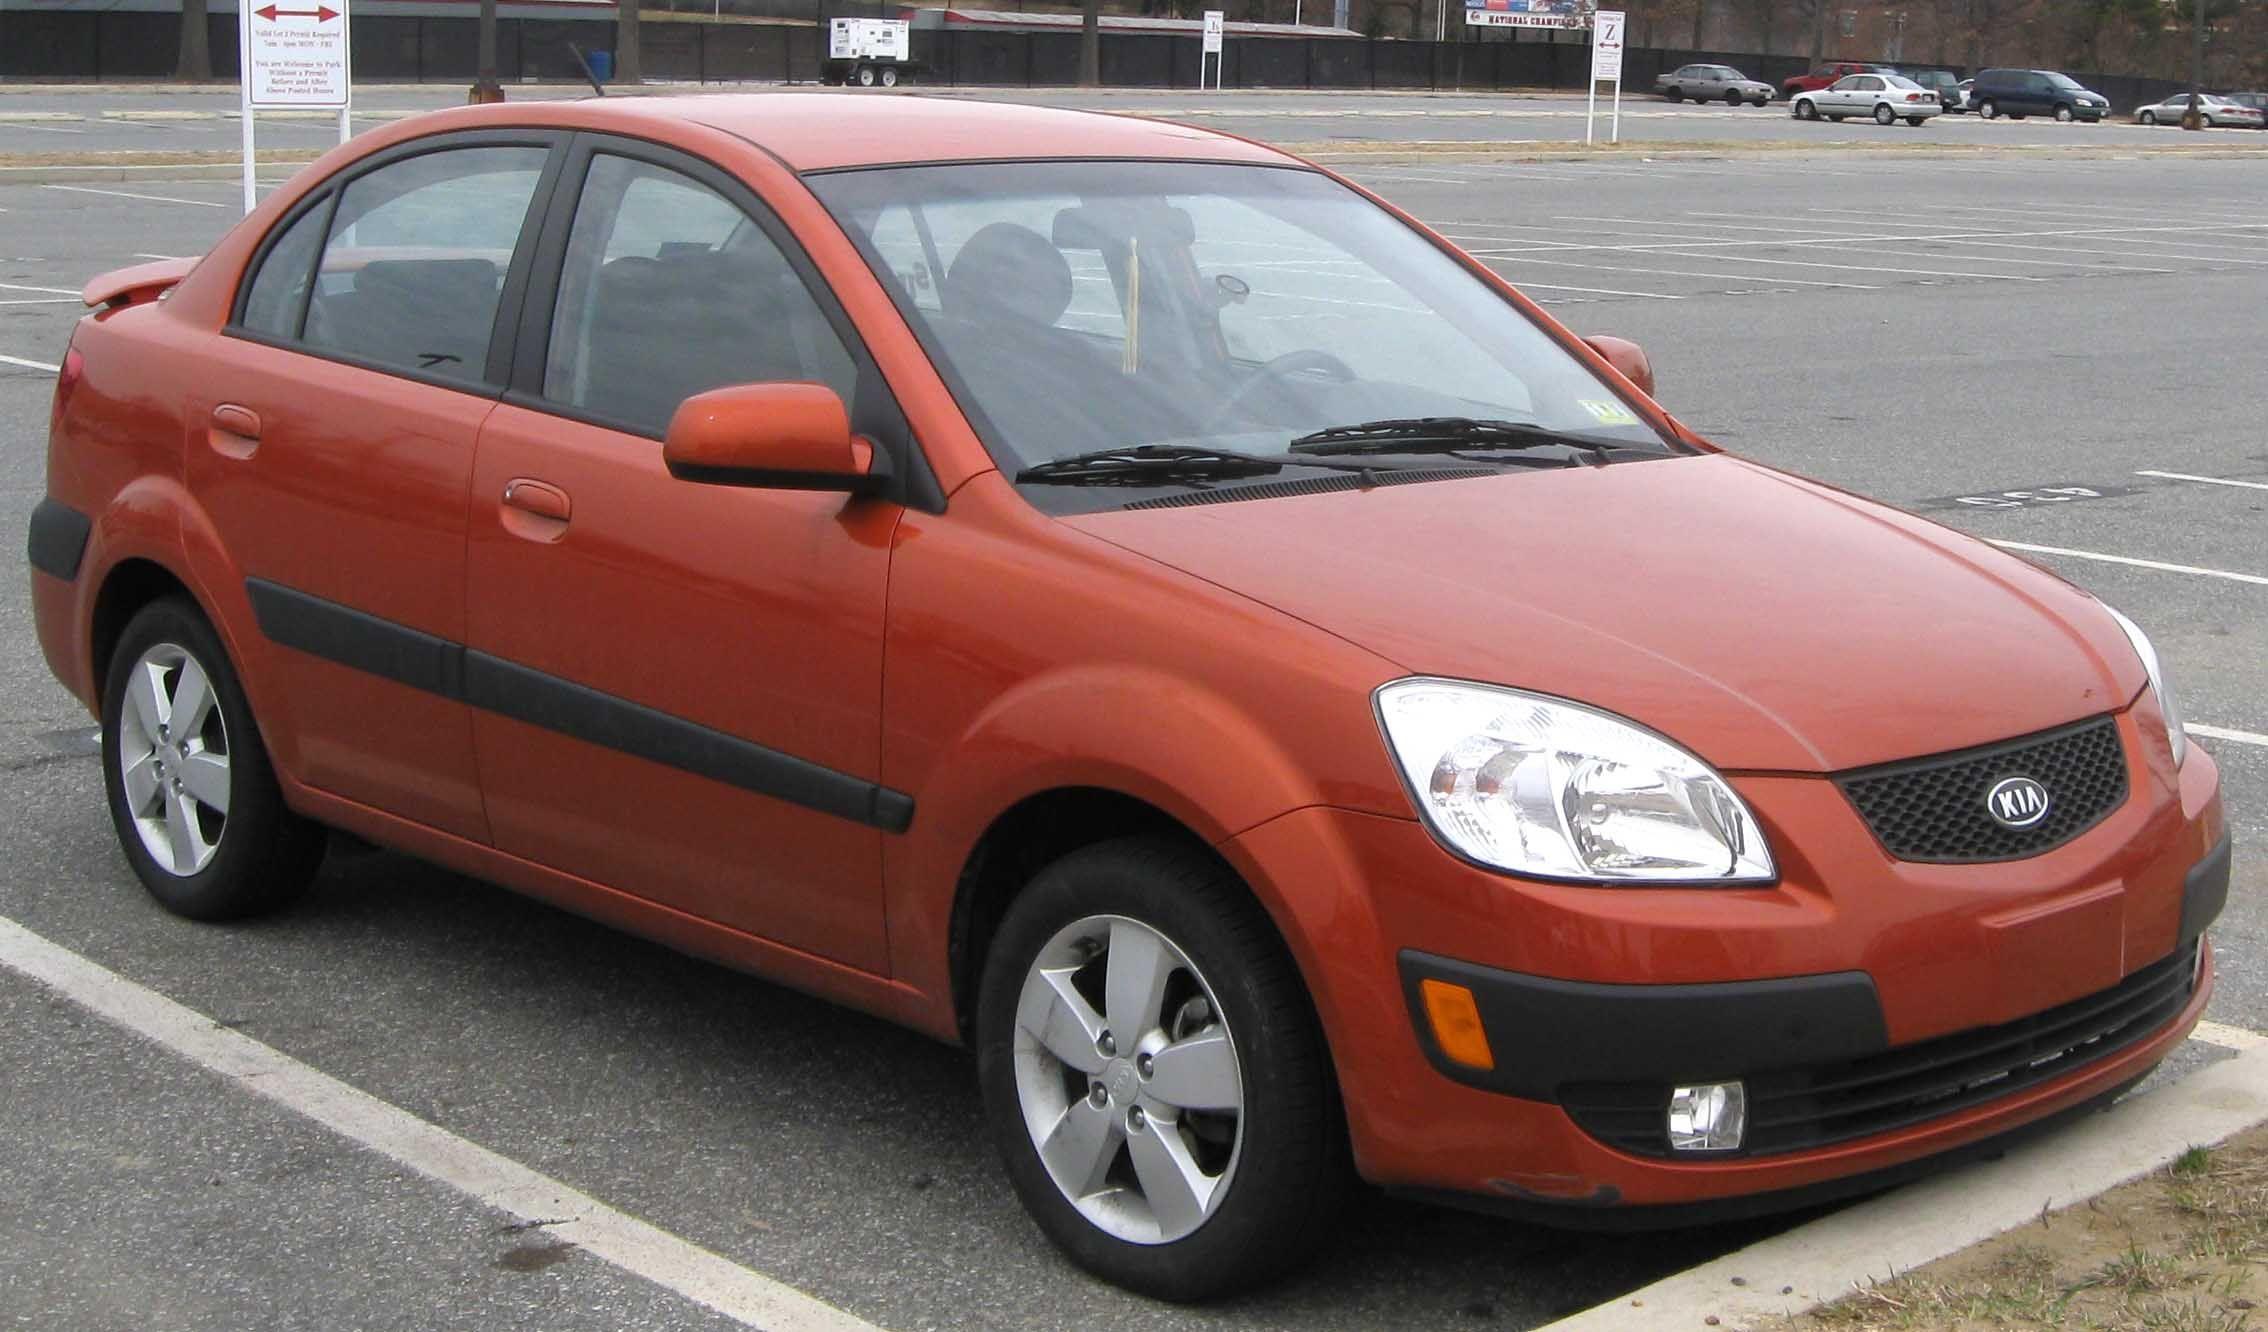 Kia Cars Uk For Sale